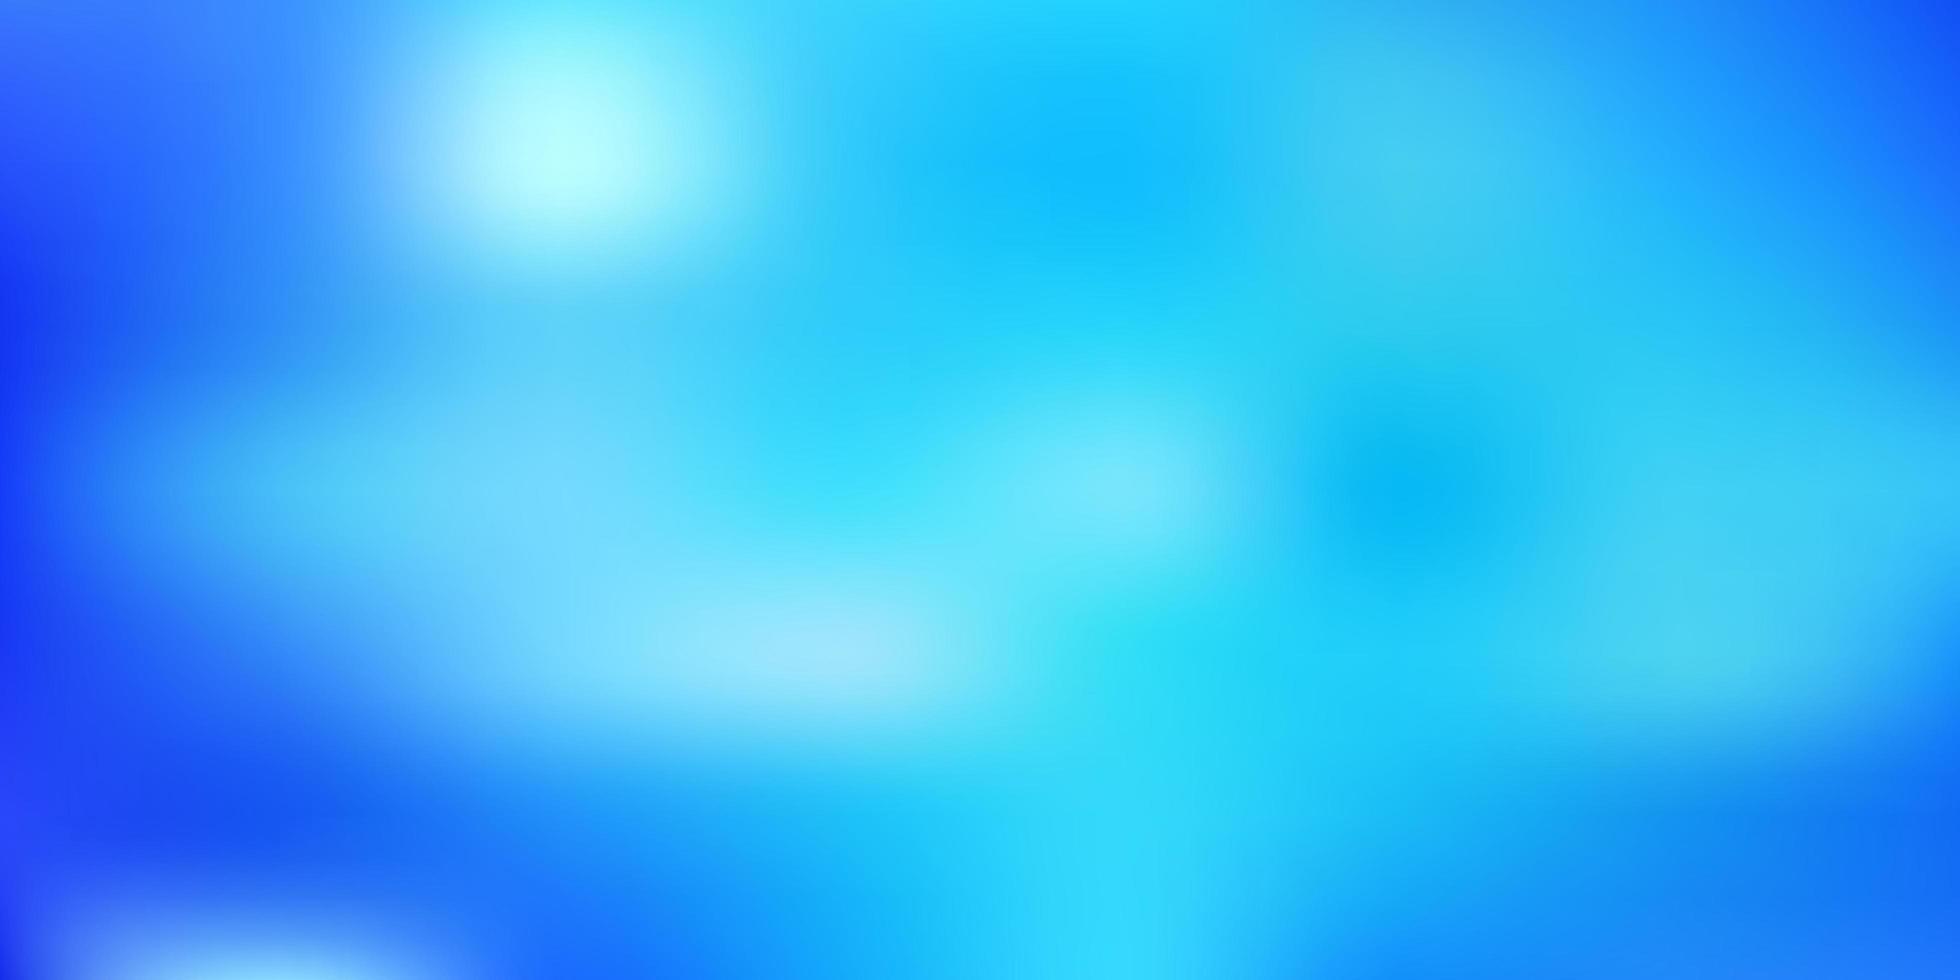 hellblaues abstraktes Unschärfelayout. vektor